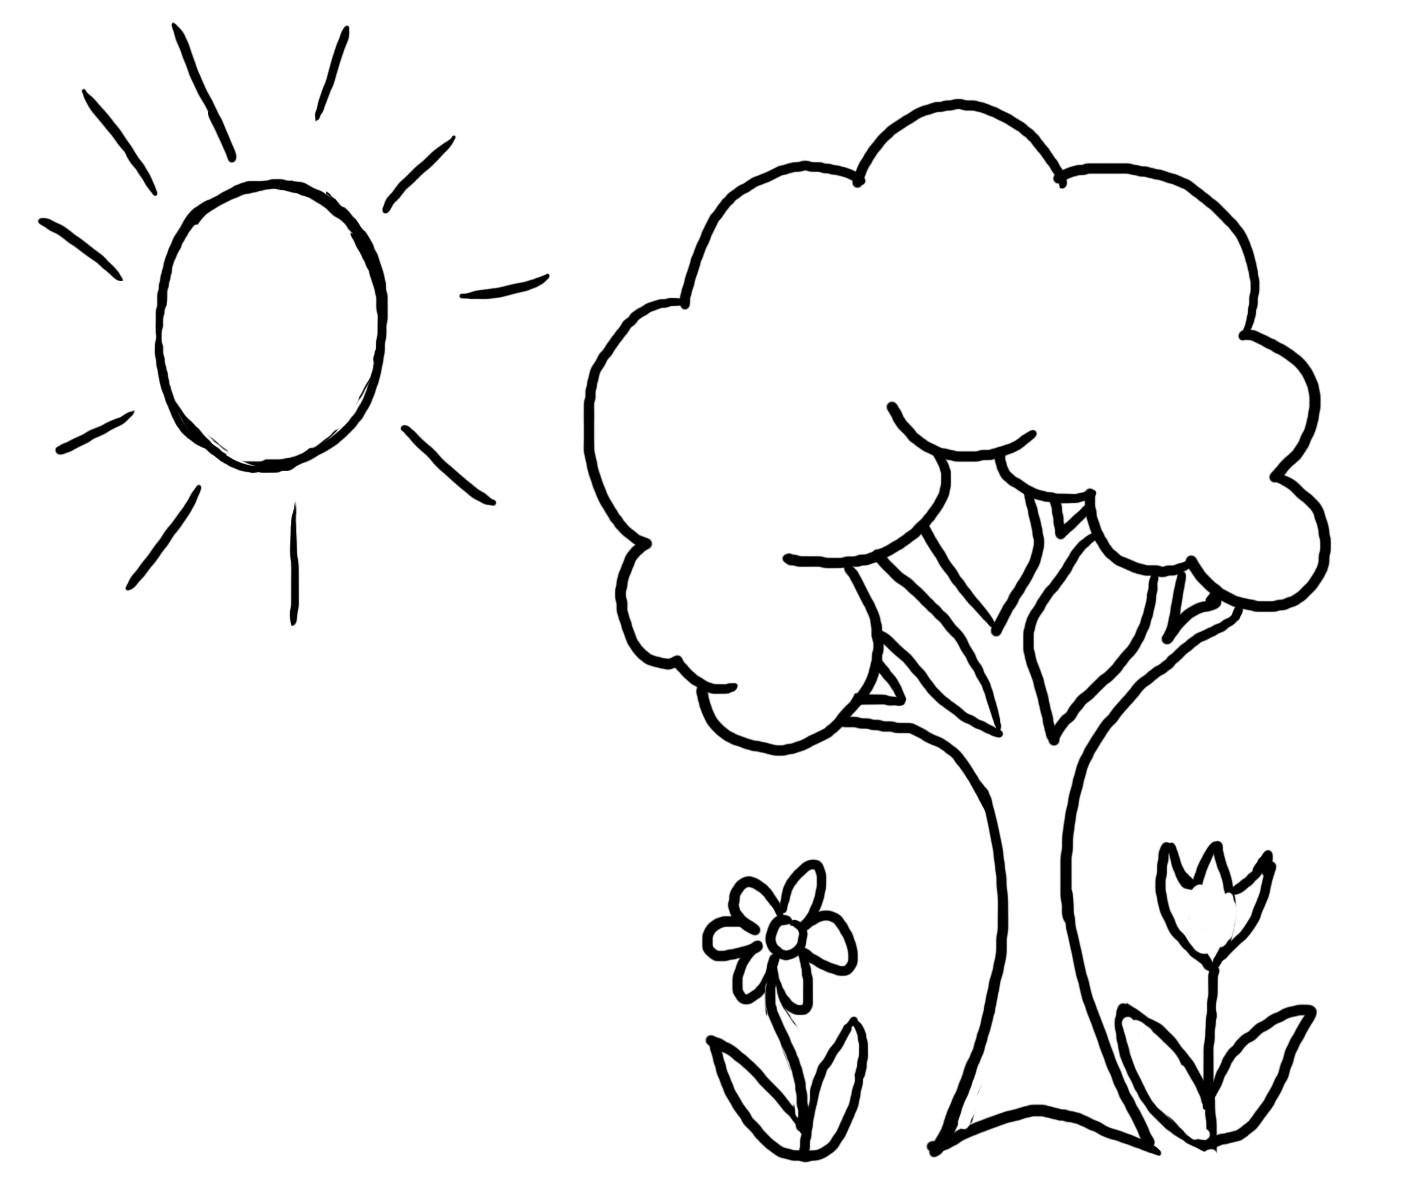 Free Coloring Sheets For Kids For Spring  Раскраски деткам Раскраски о весне скачать